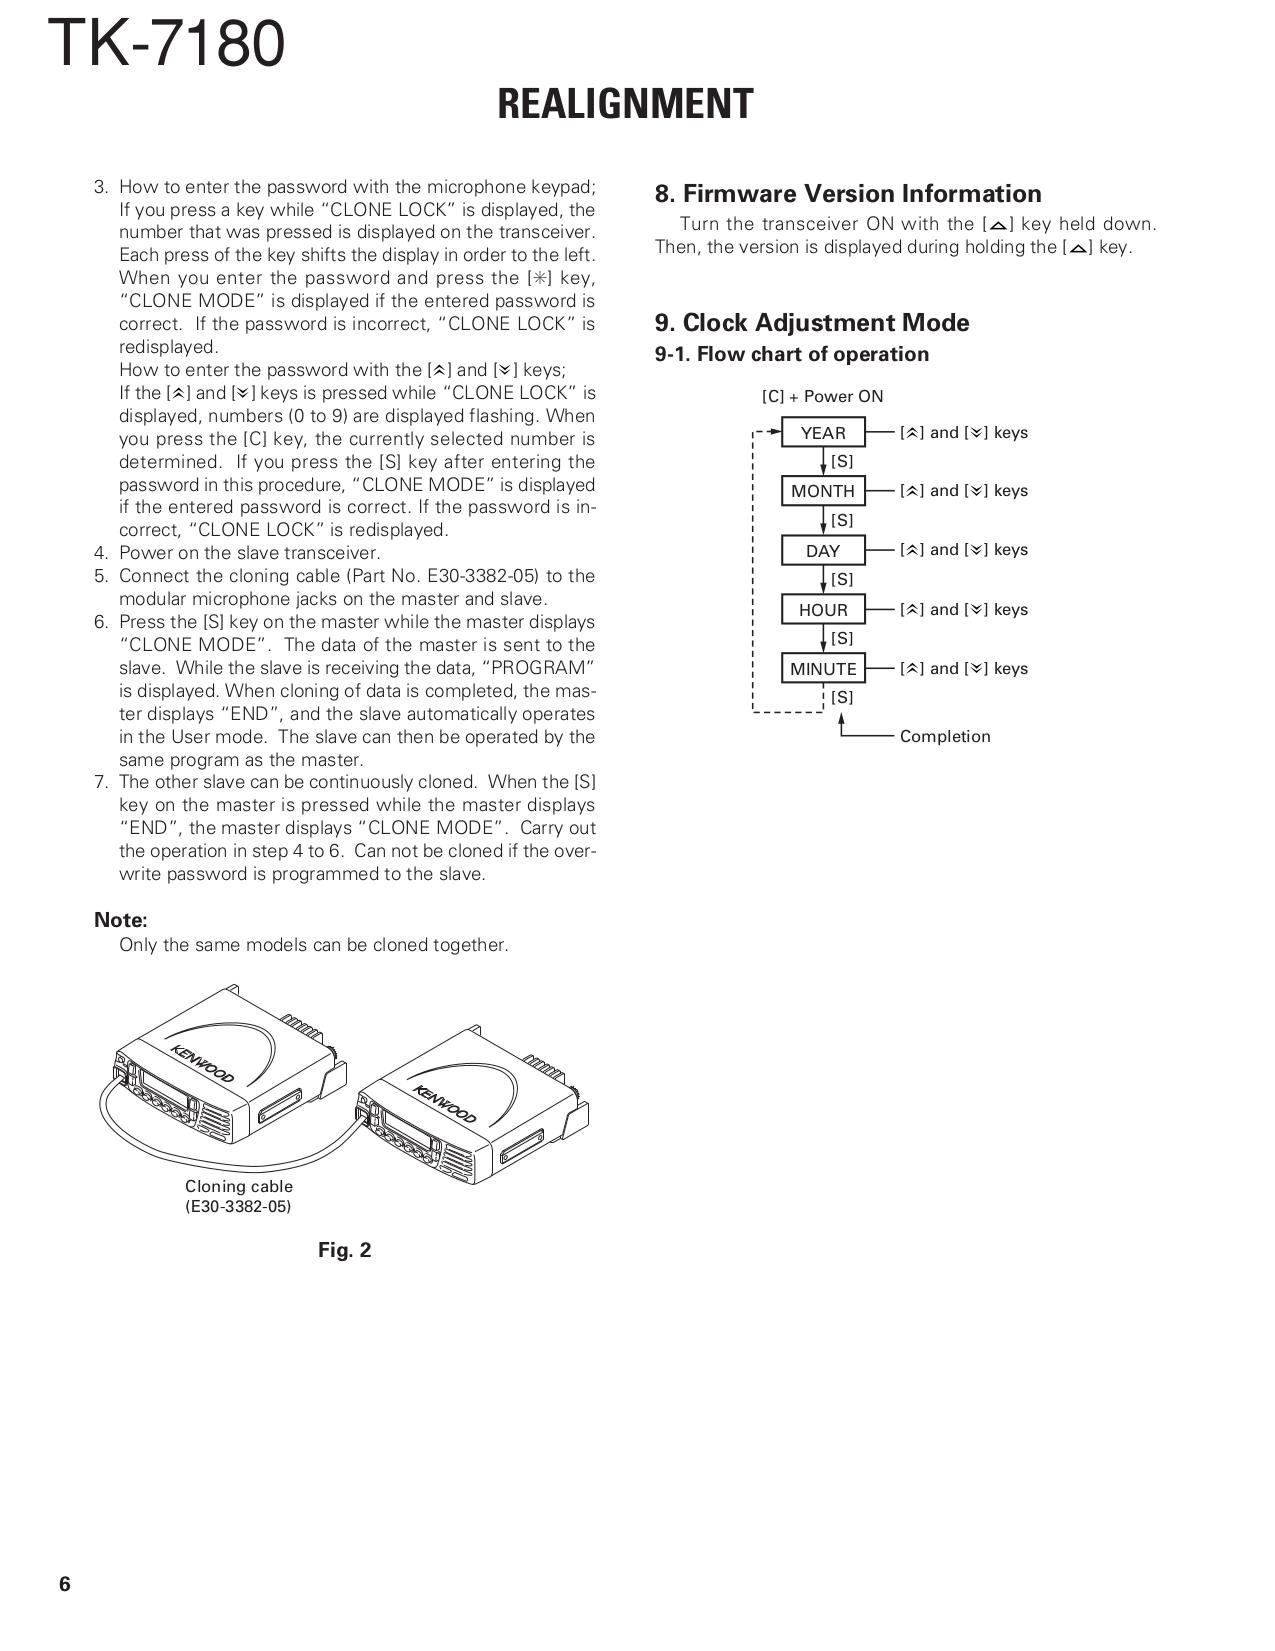 7180 Kenwood Microphone Wiring Diagram headlight wire harness – Kenwood Tk 3180 Radio Wiring Diagram